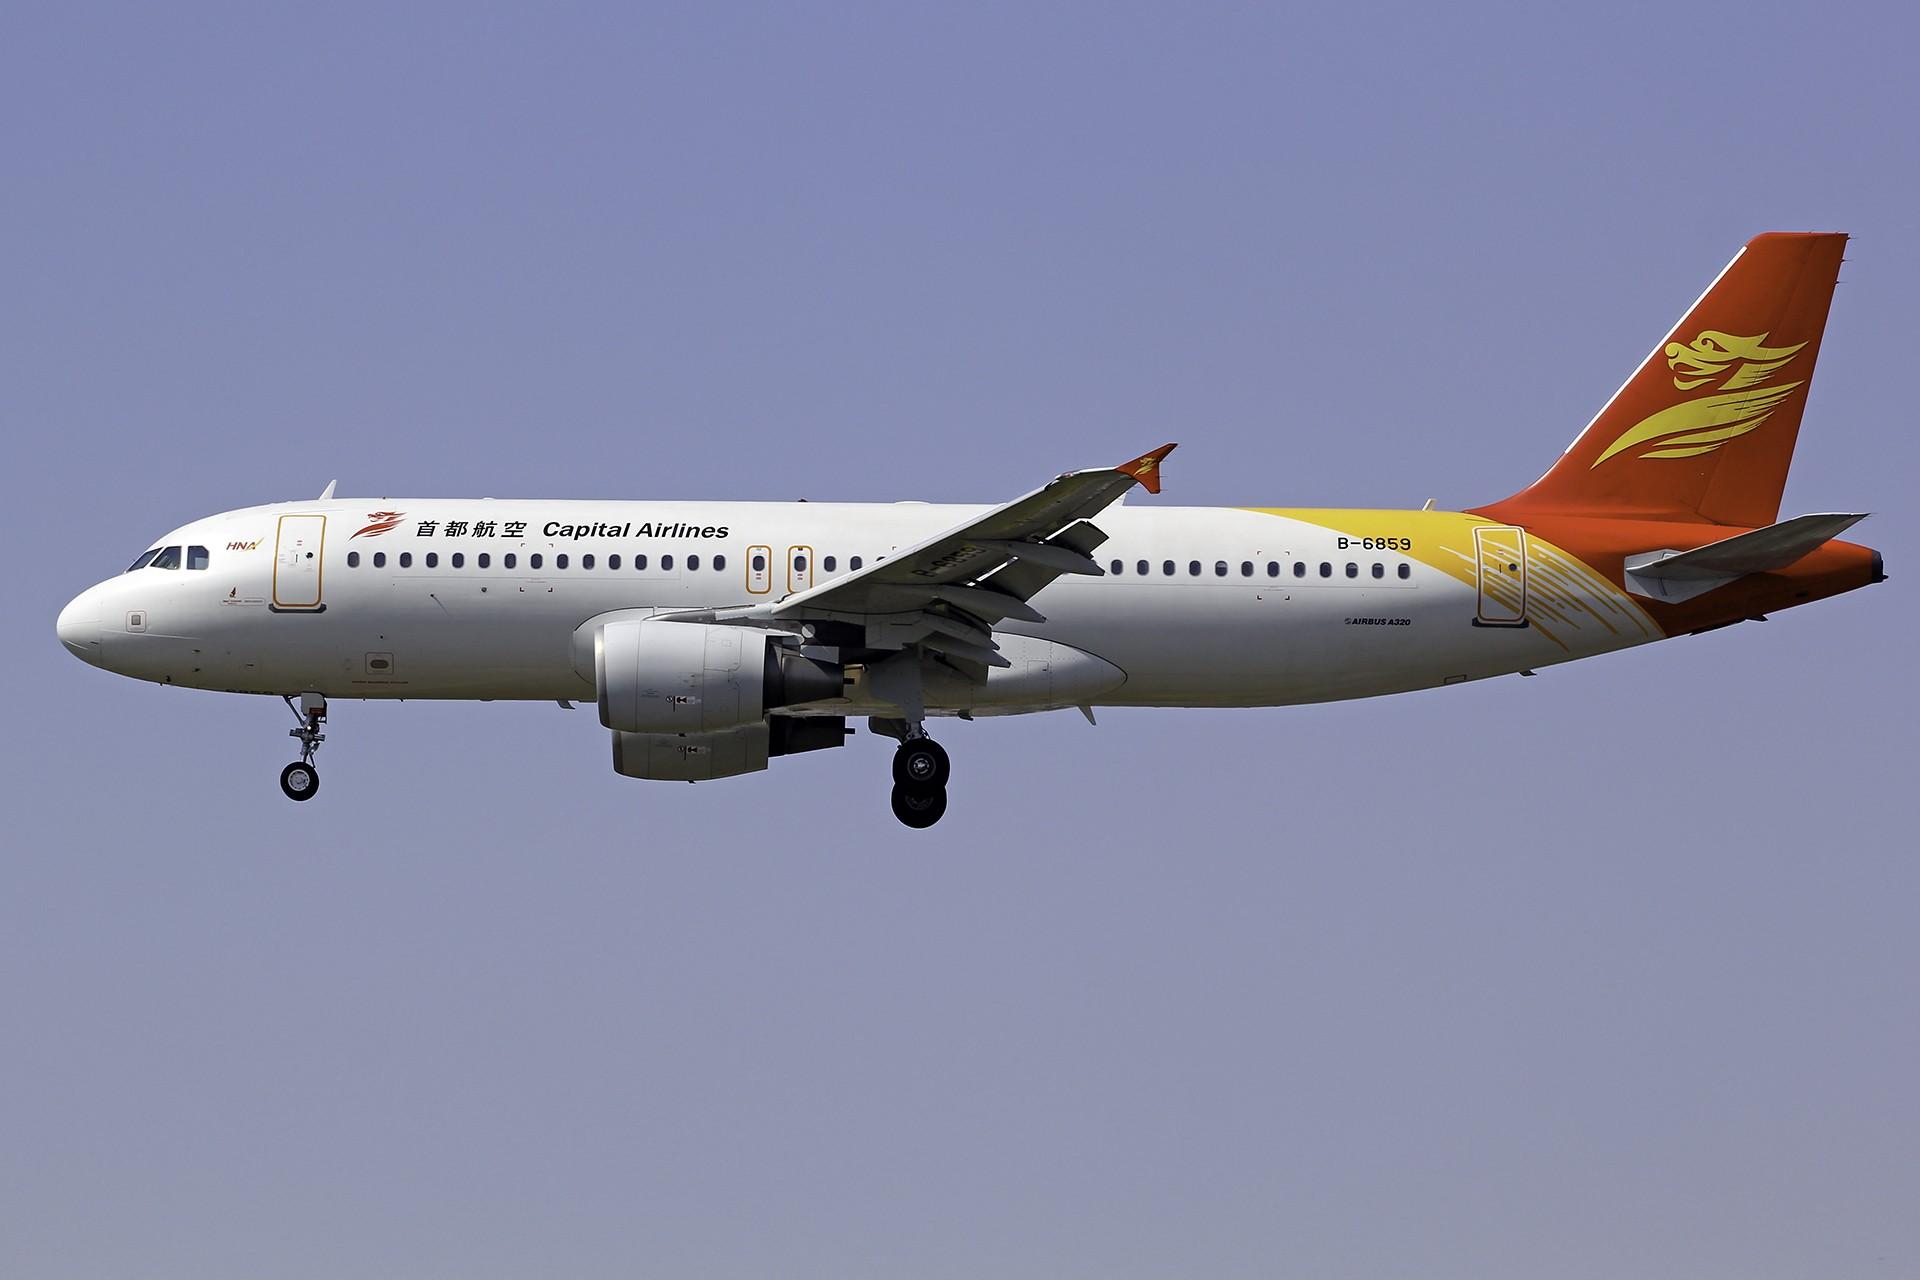 Re:[原创][DLC]滨海大连,浪漫之都….1920x1280pix 连载中 AIRBUS A320-200 B-6859 中国大连周水子国际机场